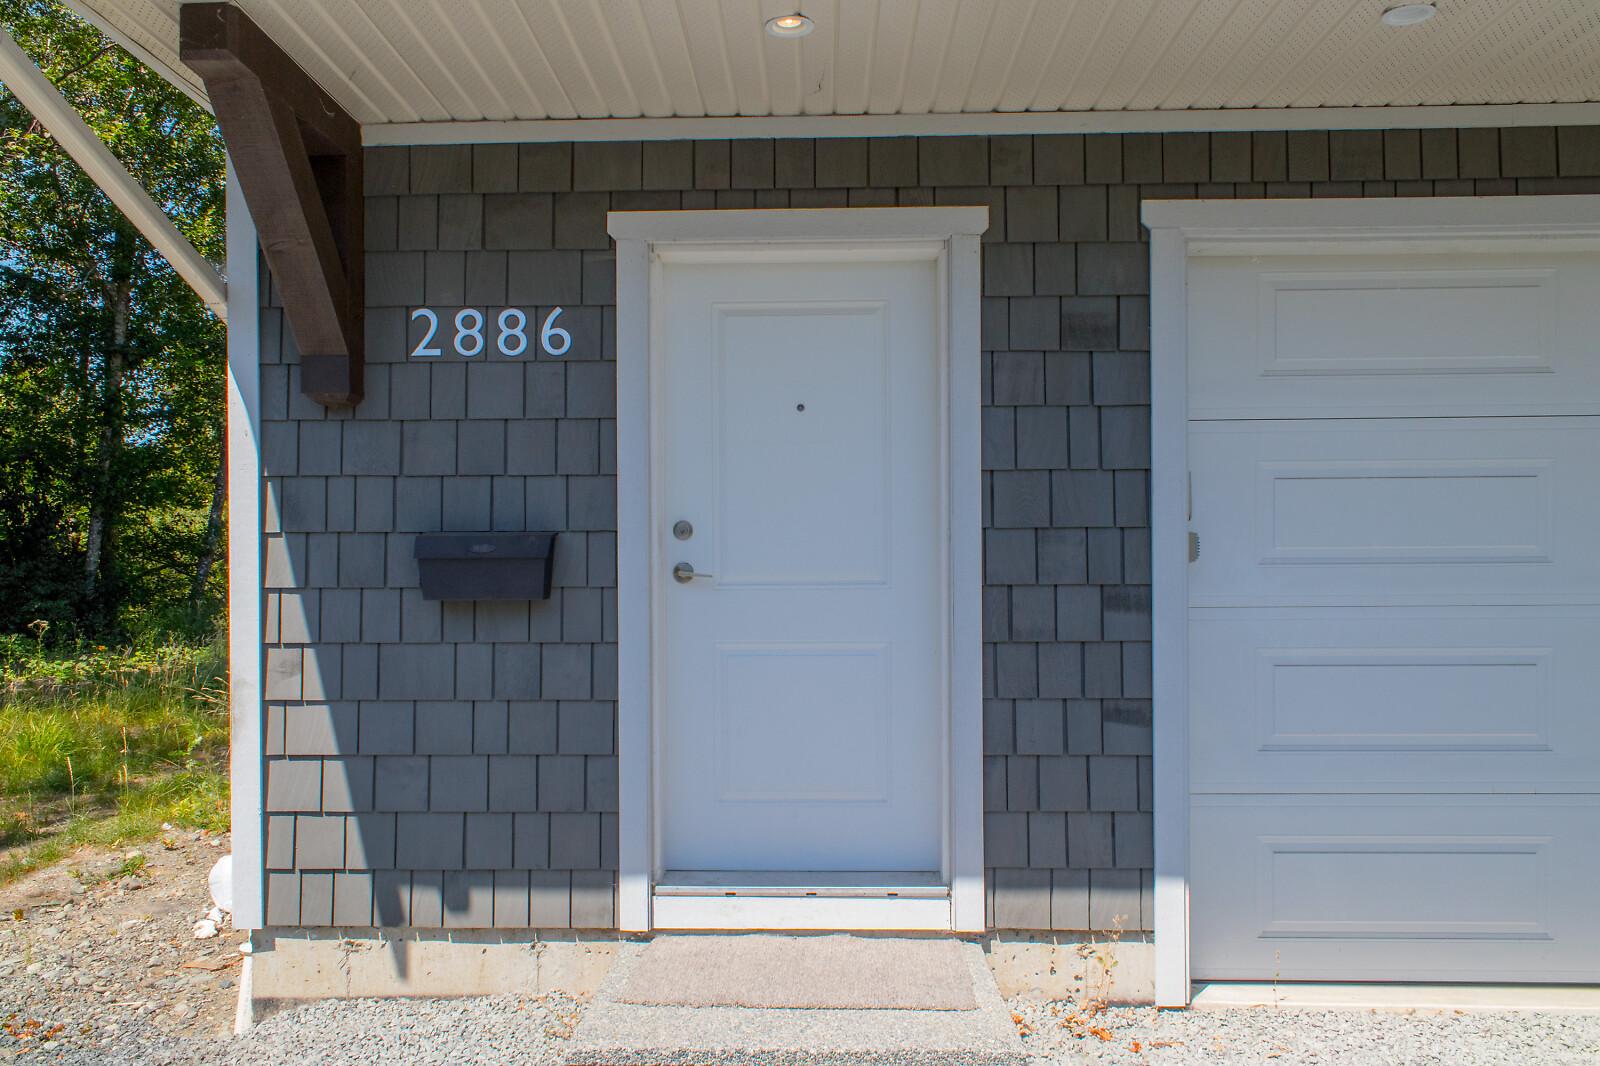 2886 Sherman Road, Duncan, British Columbia  V9L 2B - Photo 2 - 882290